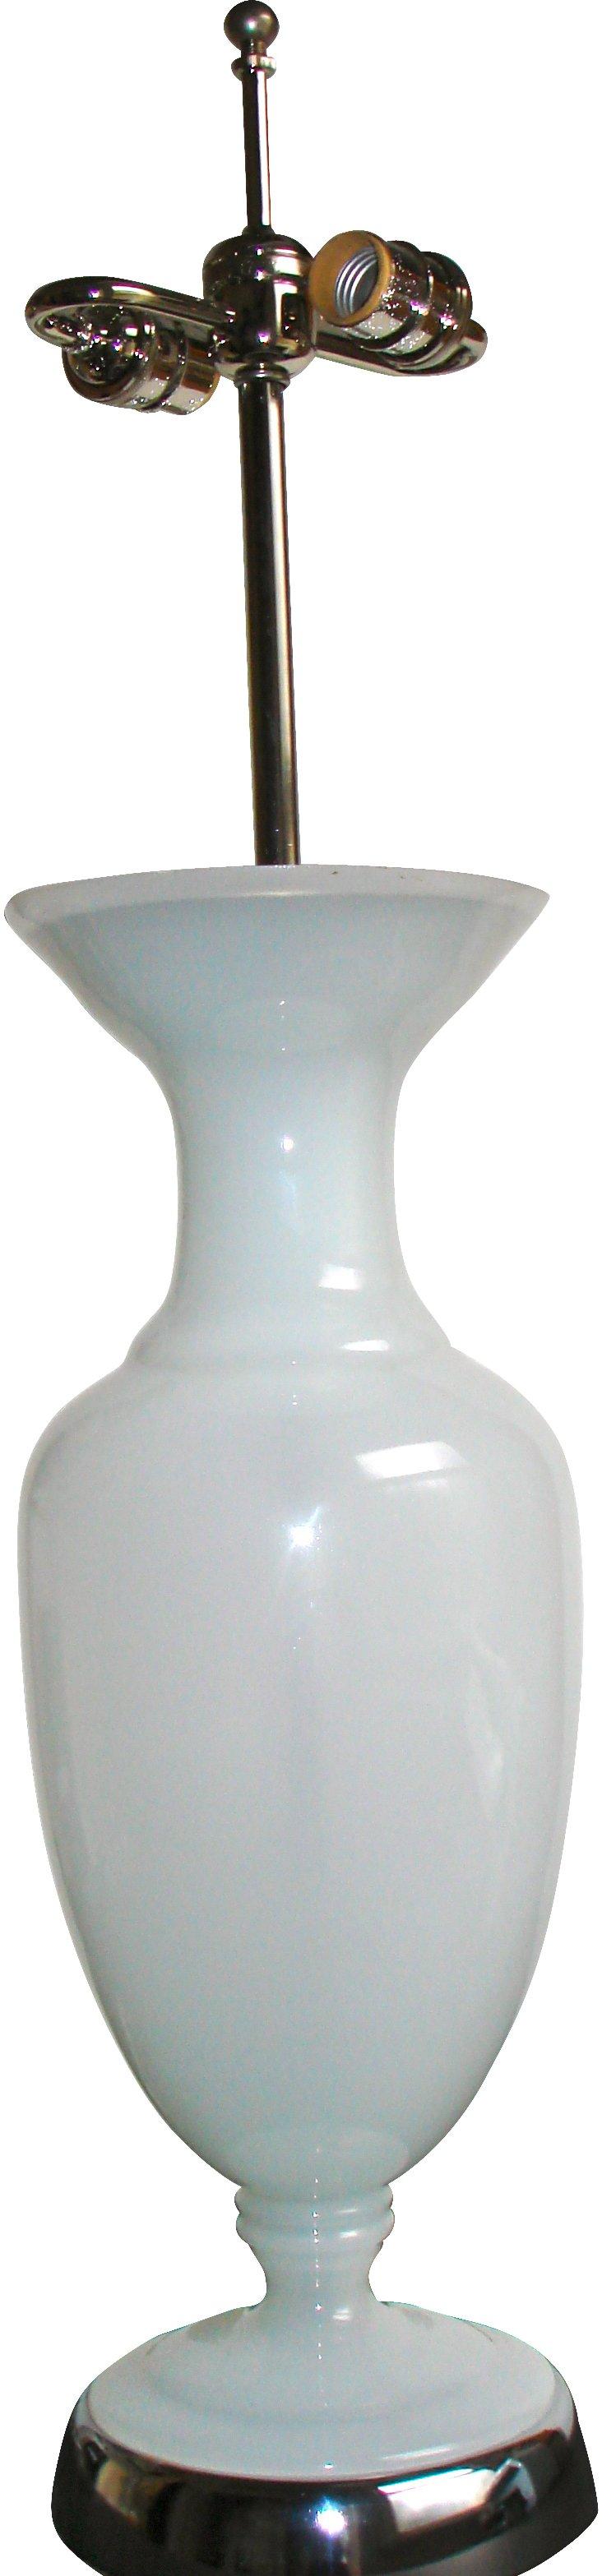 Opaline Glass Urn Table Lamp